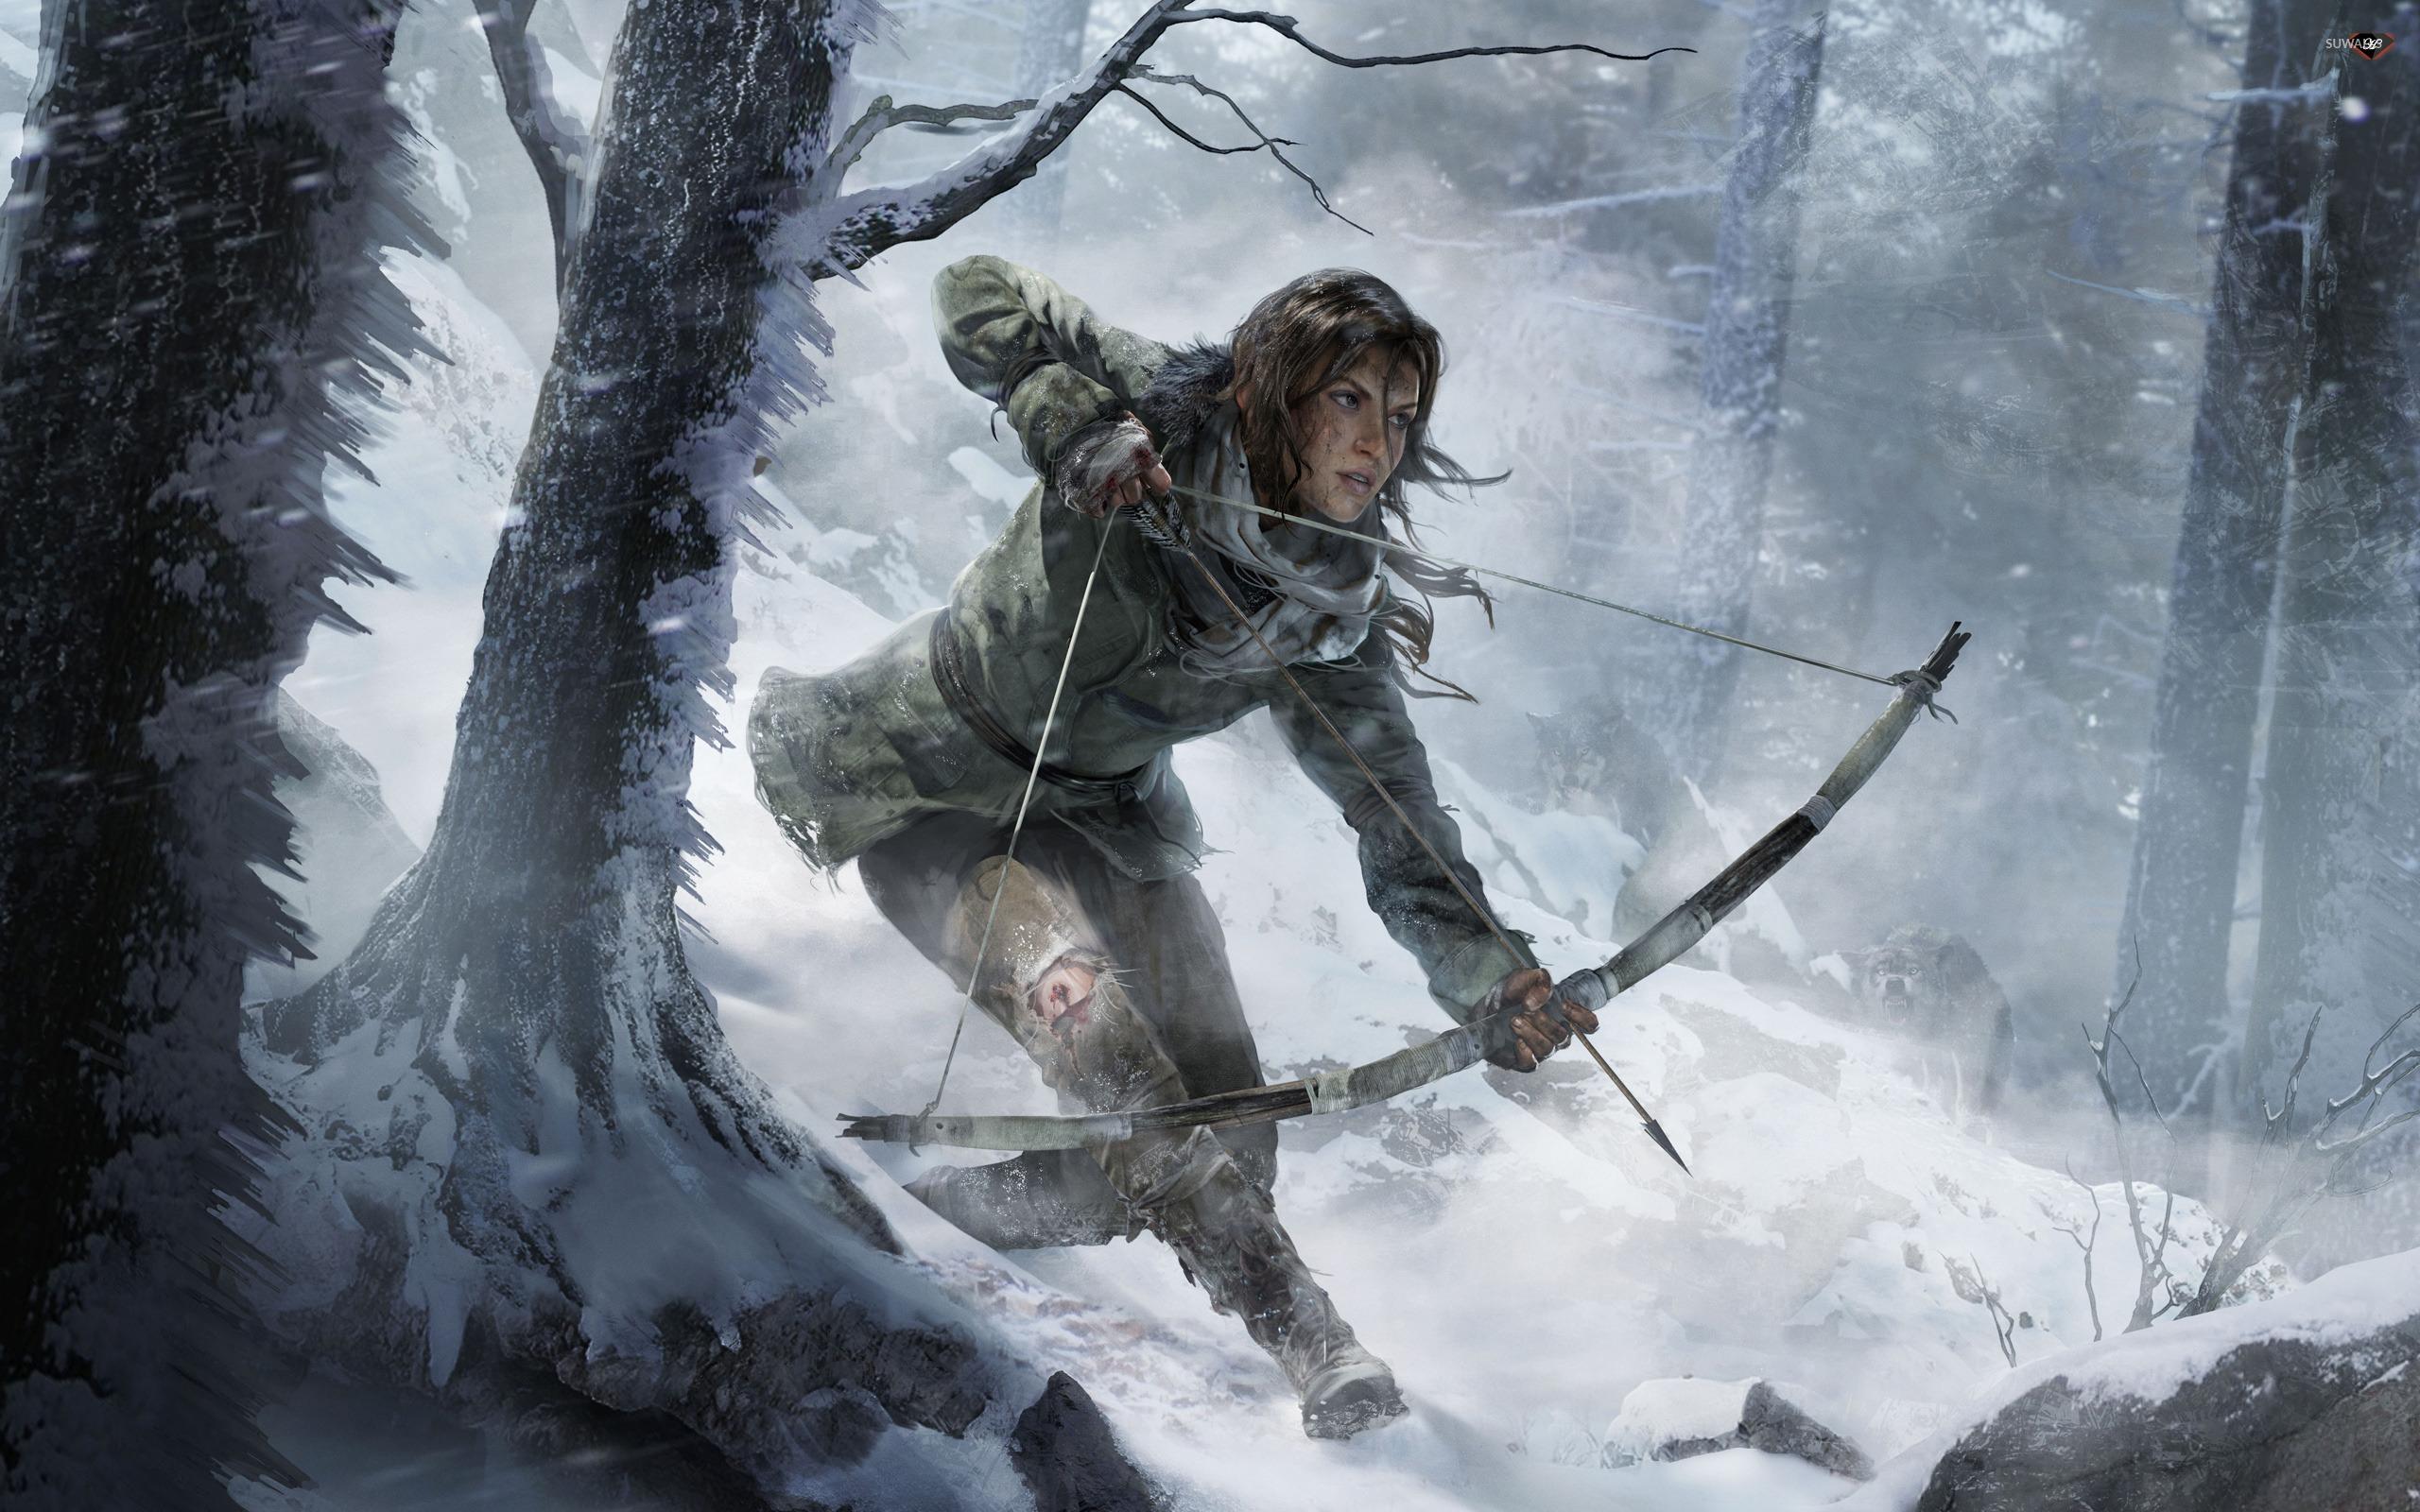 Lara Croft Rise Of The Tomb Raider Wallpaper Game Wallpapers